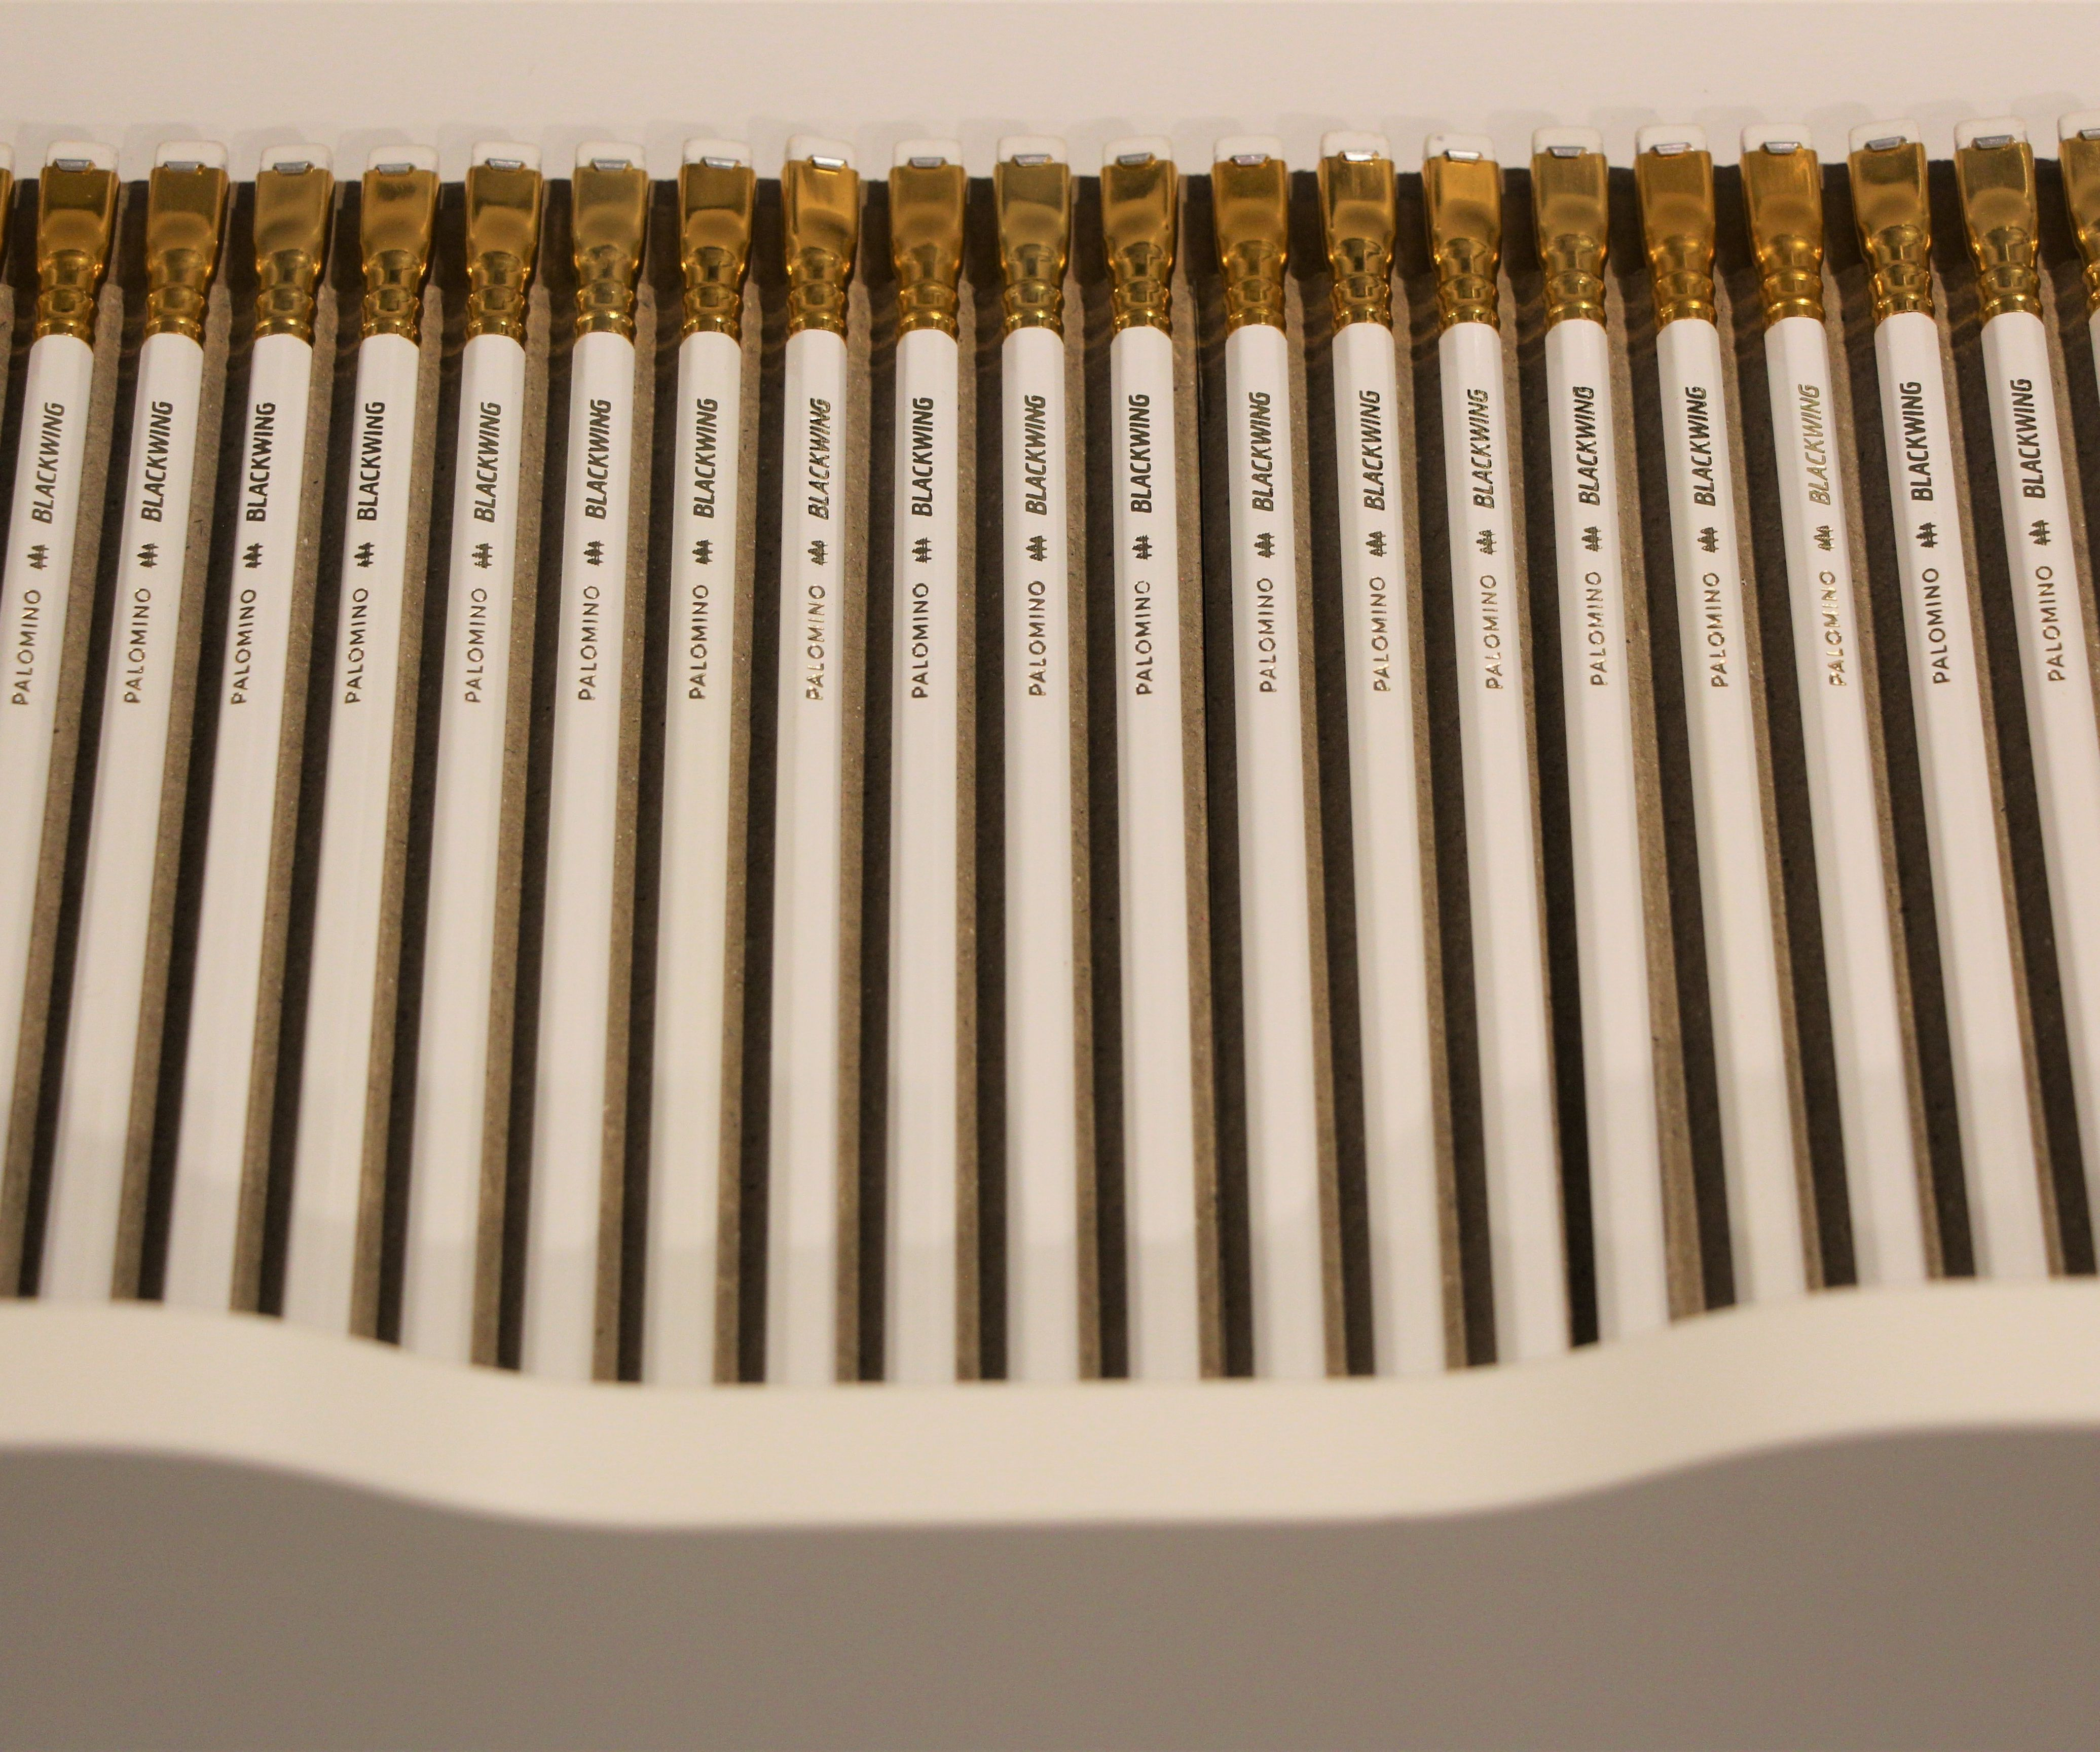 Corrugated Cardboard Pencil Organizer